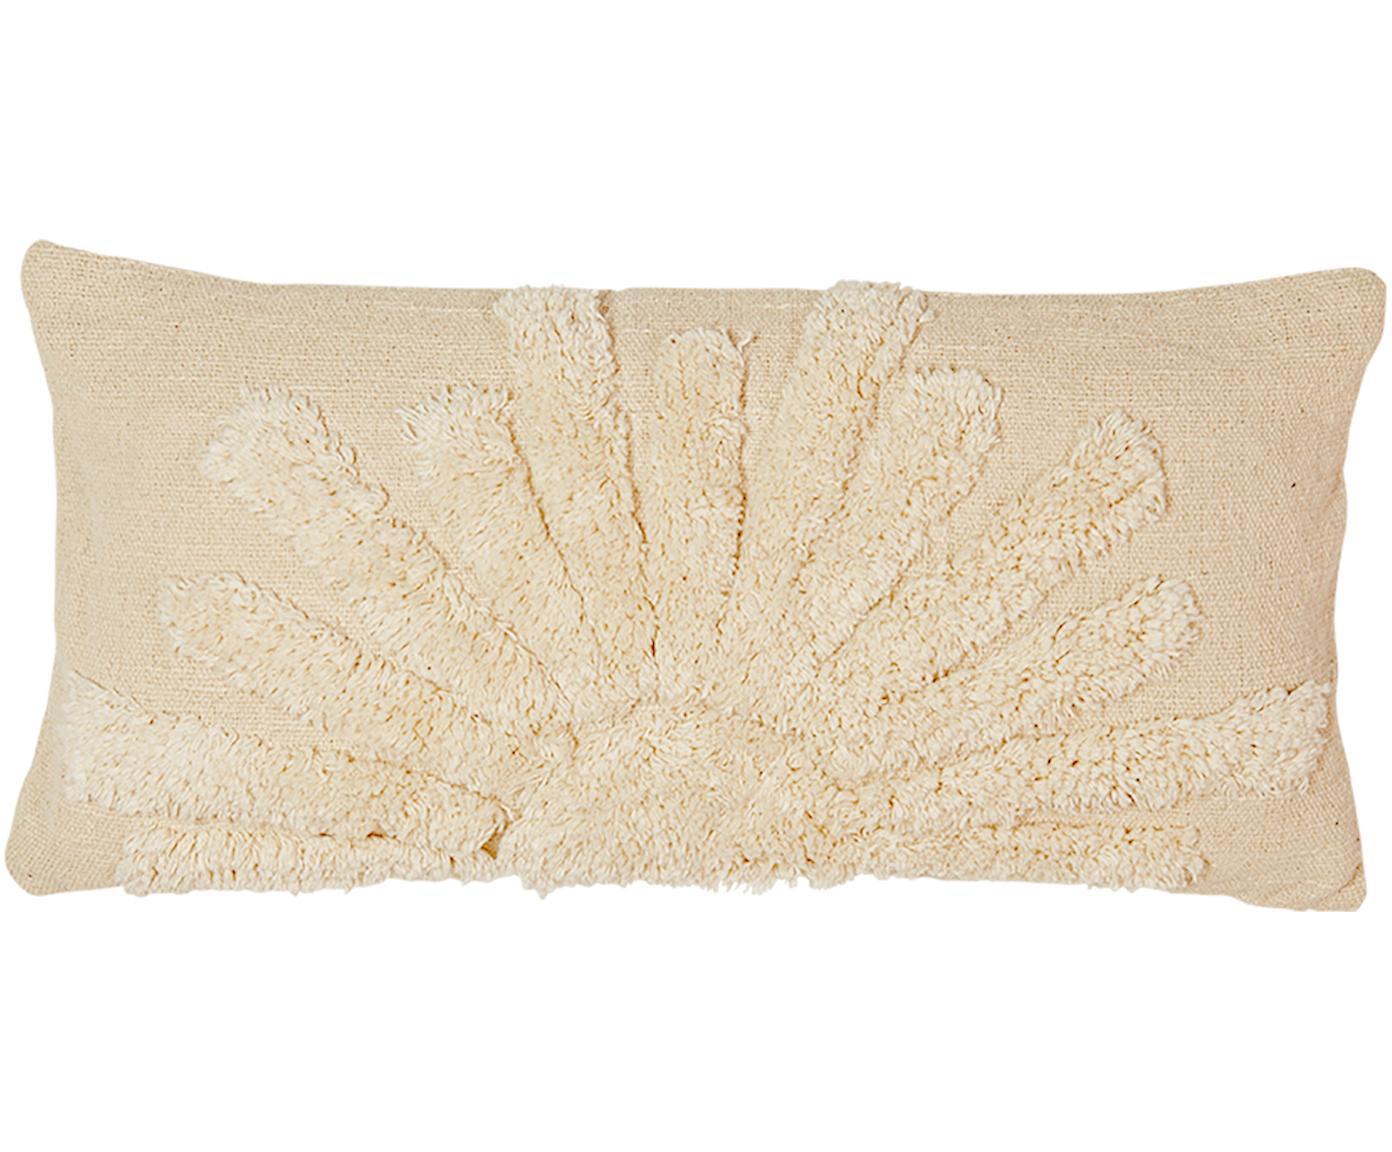 Federa arredo in cotone bio Sunrise, Cotone organico, Beige, Larg. 30 x Lung. 60 cm